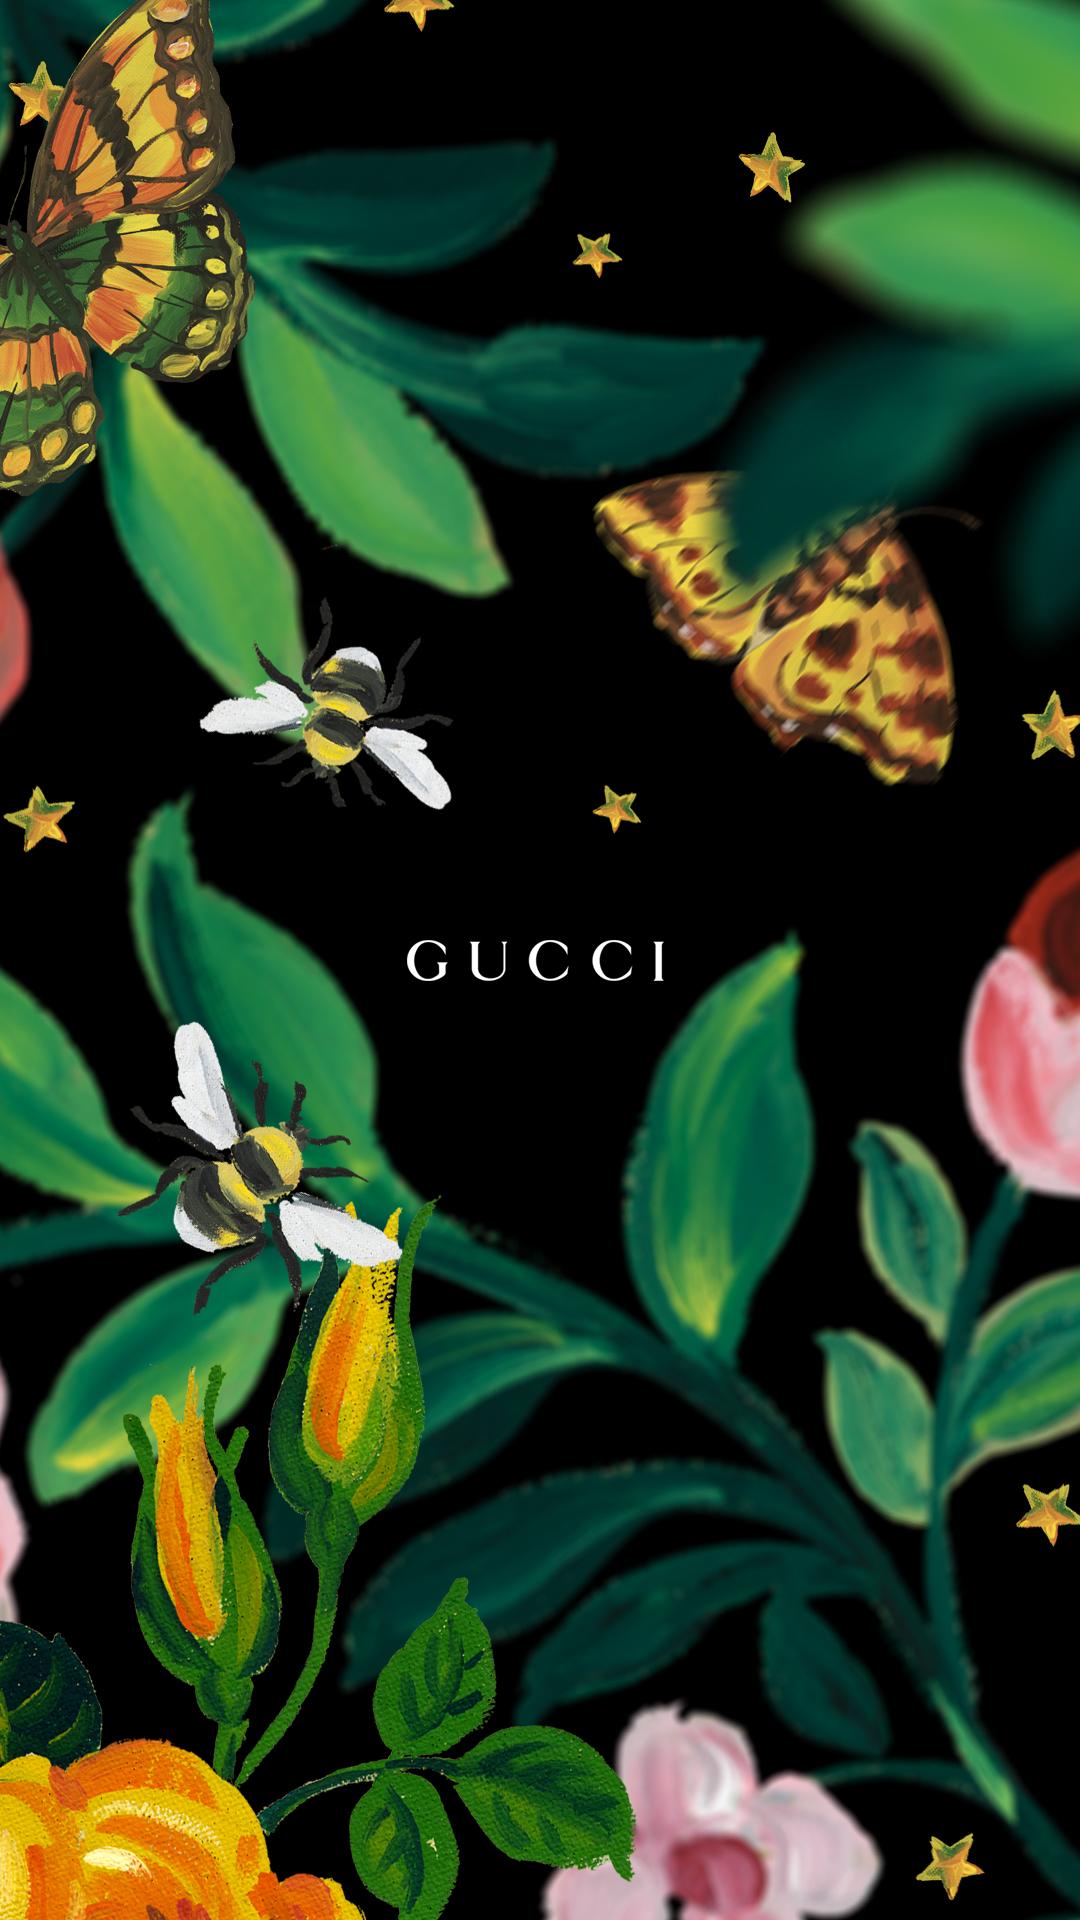 Gucci Garden Screensaver Gucci Official Site United States 1080x1920